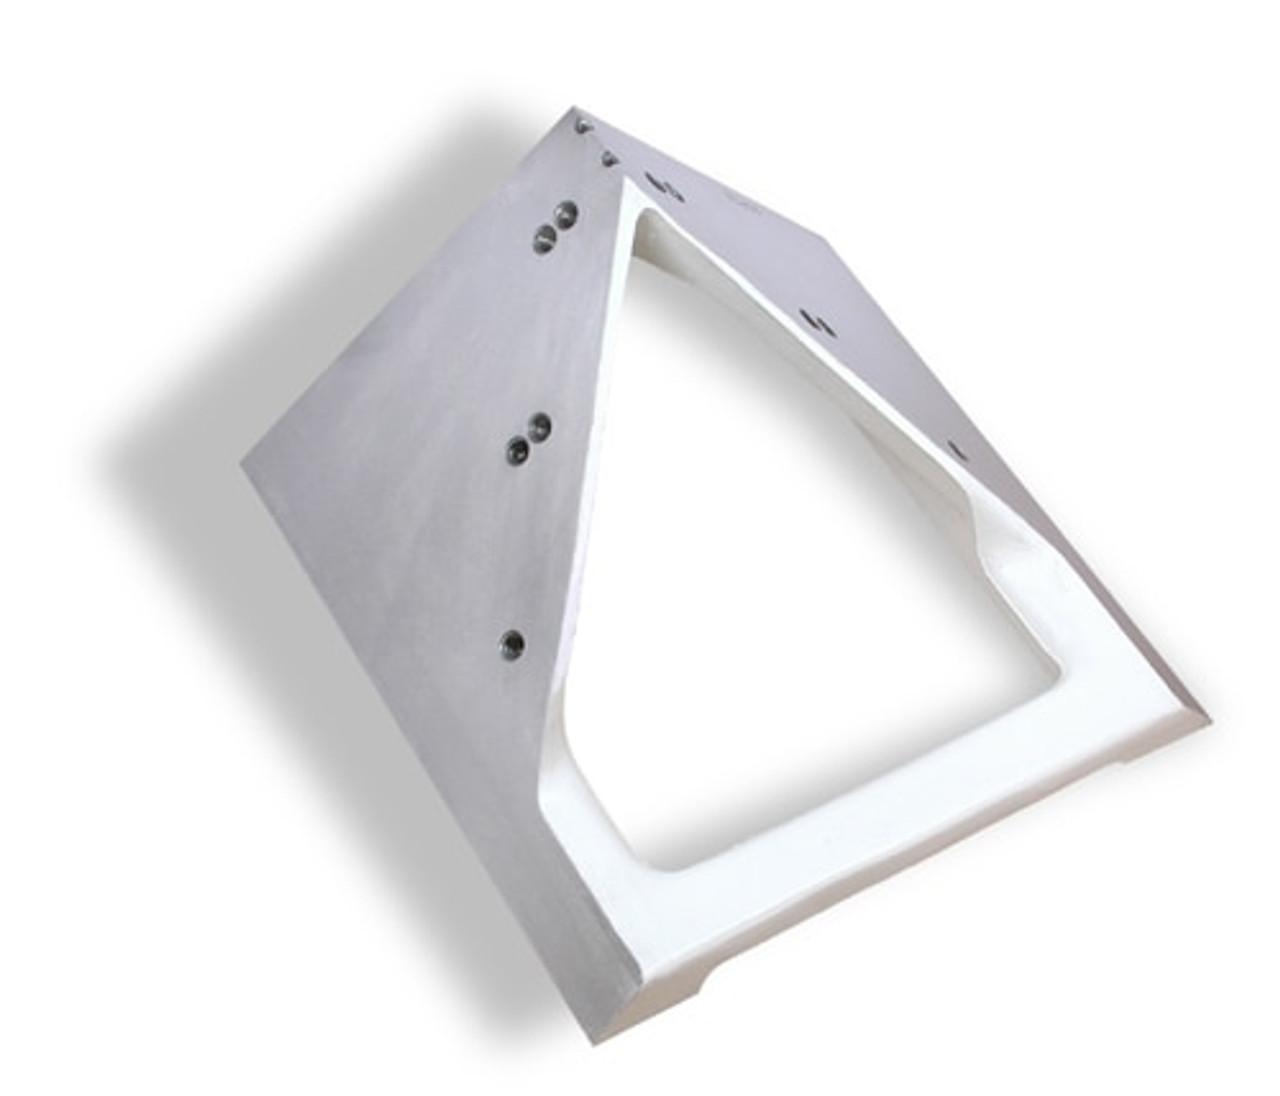 N7141 smaller cutting head for MORSO NXLEH face frame notching machine, by Hoffmann-USA.com